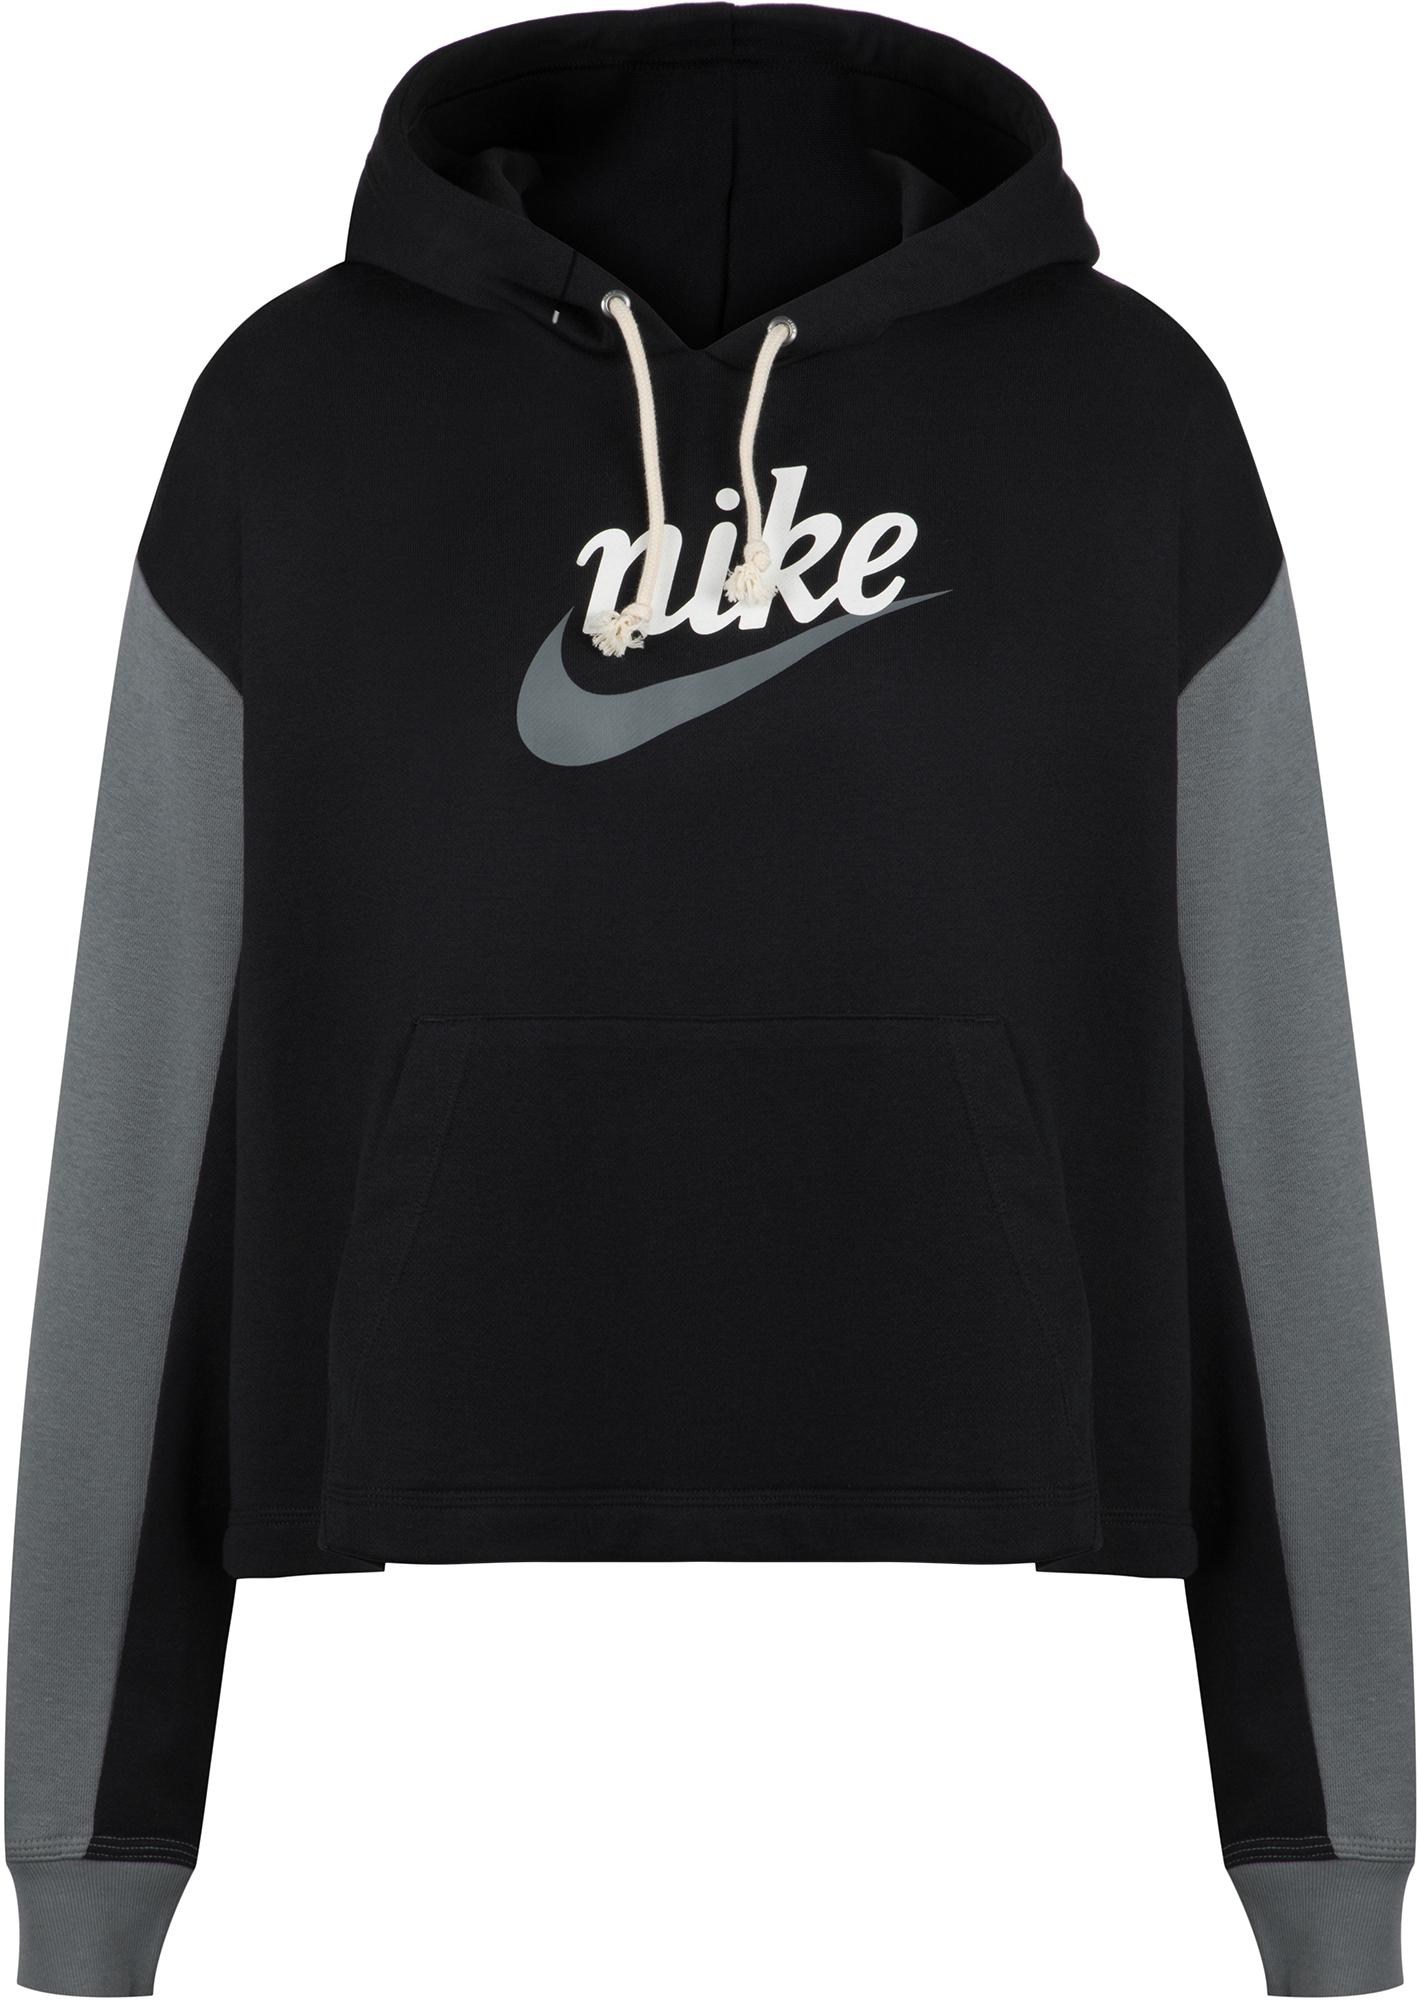 цена Nike Худи женская Nike Sportswear Varsity, Plus Size, размер 52-54 онлайн в 2017 году